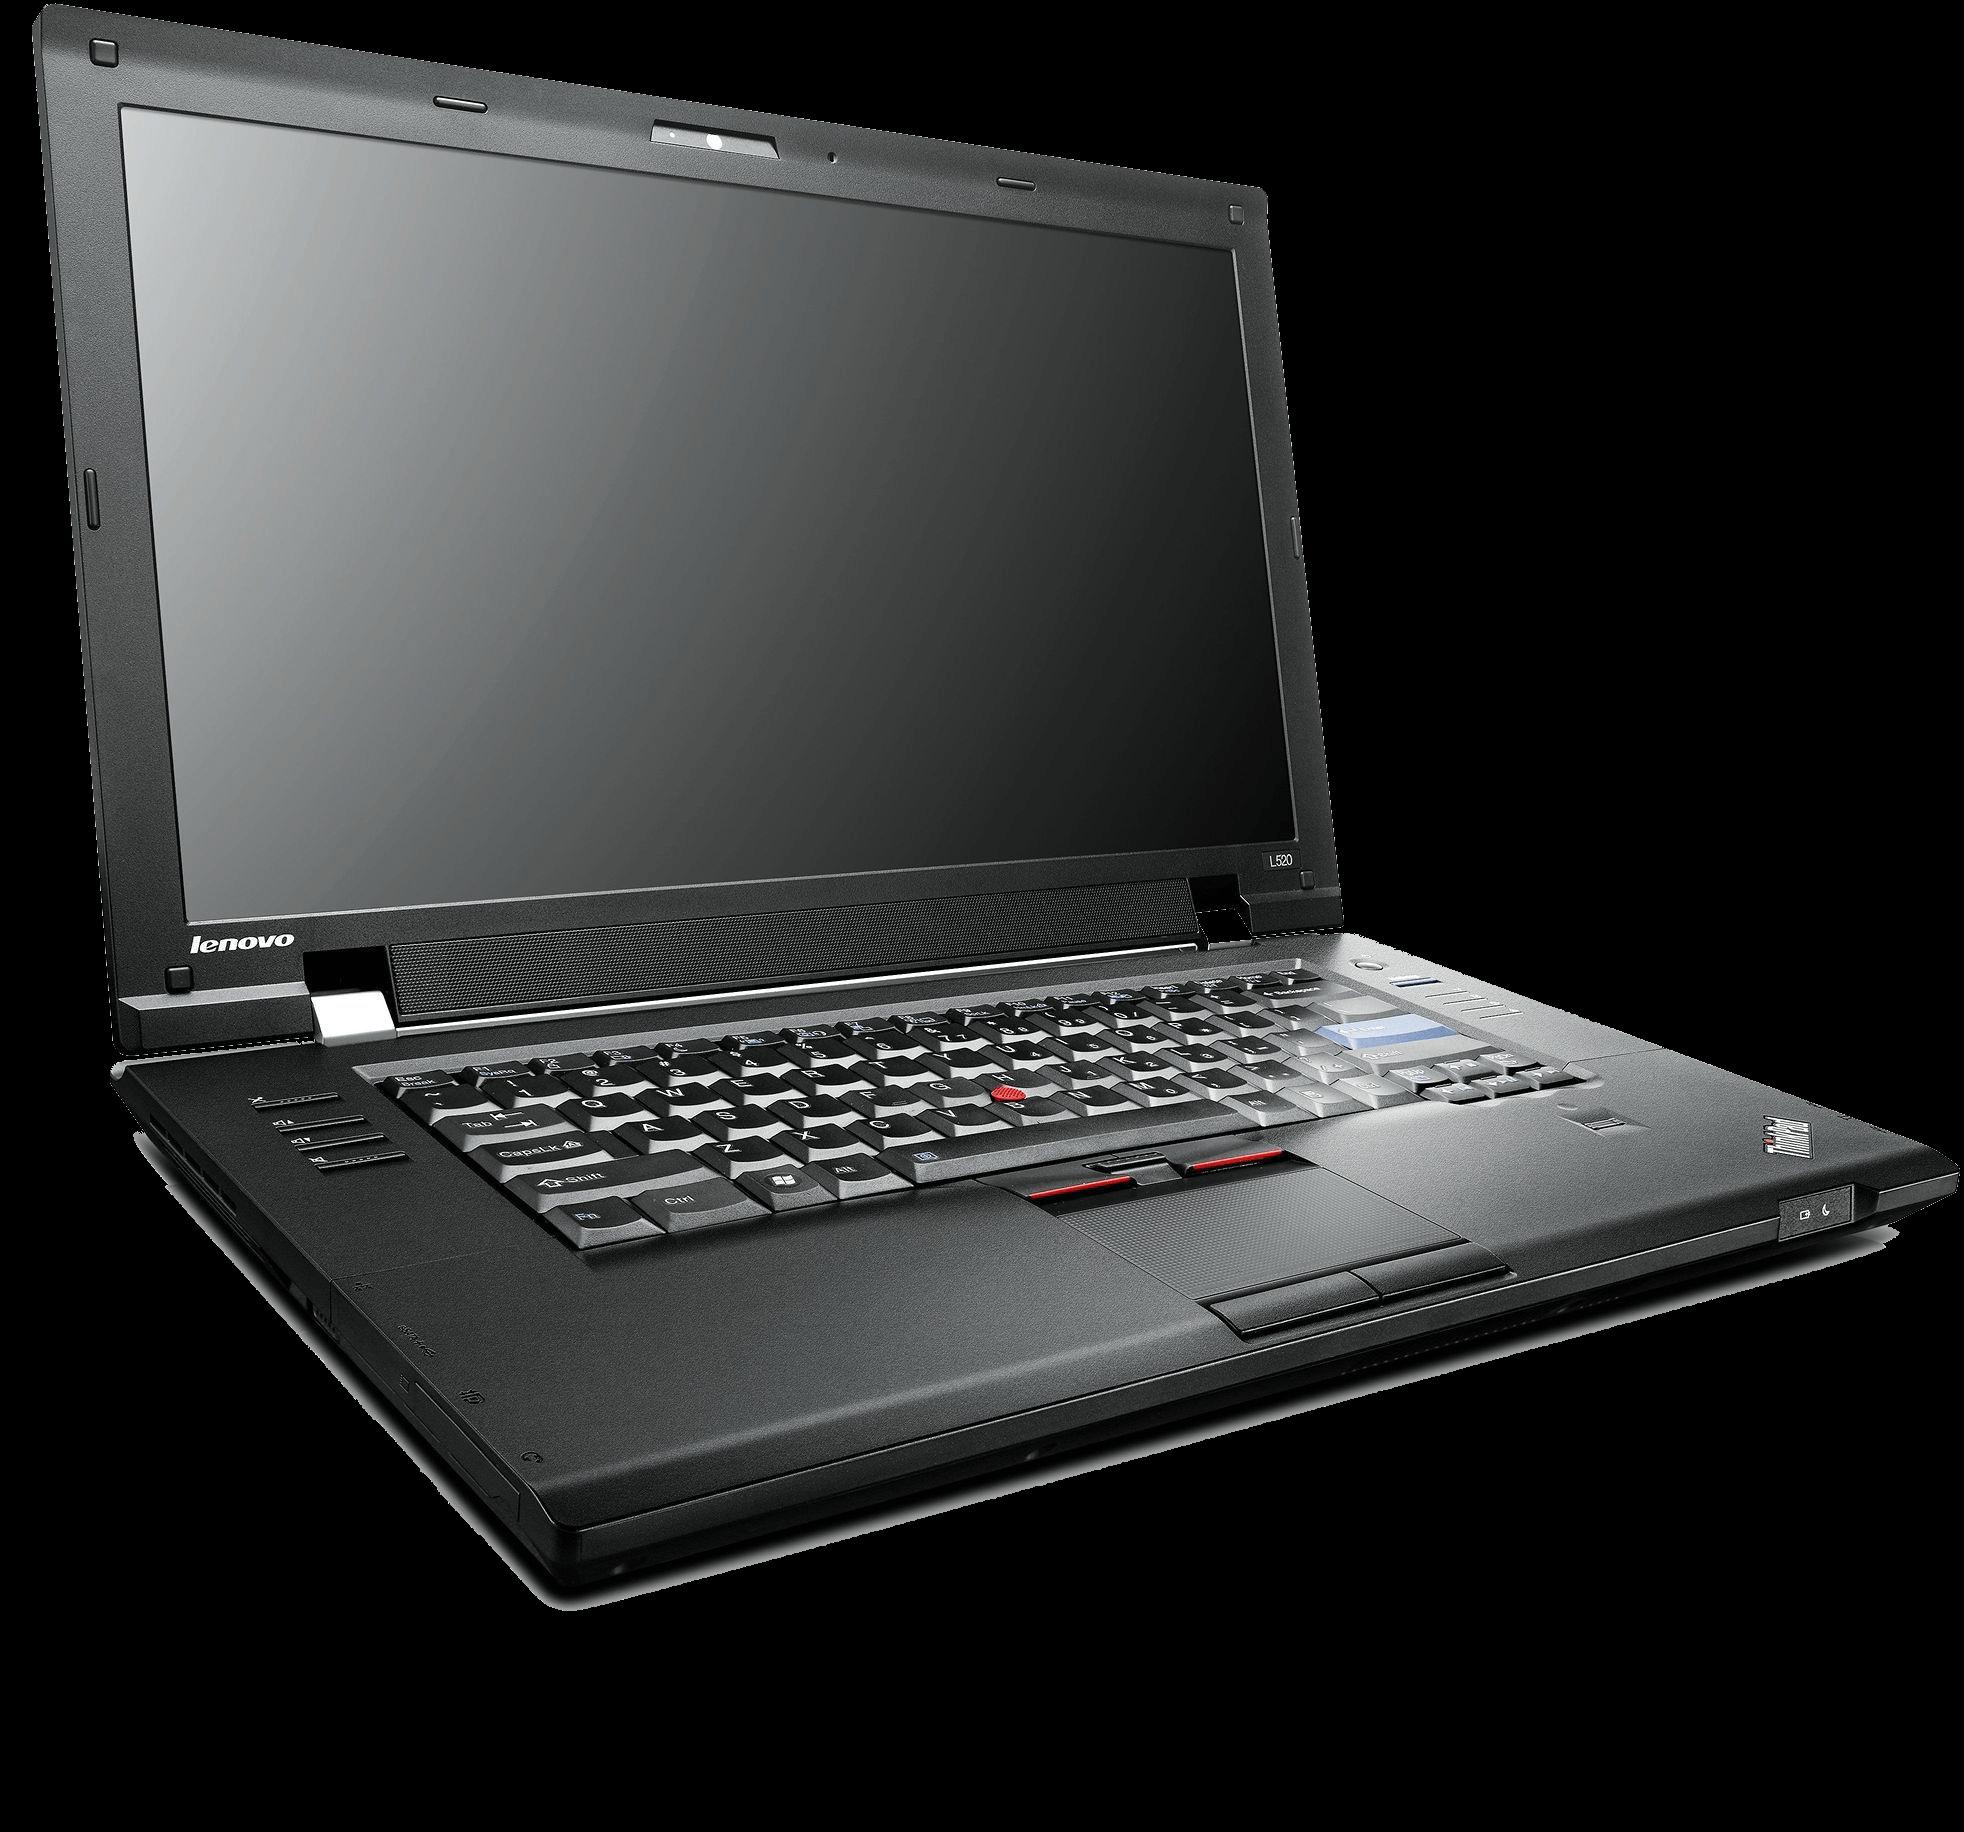 Laptop PNG Transparent image - Free PNG Laptop